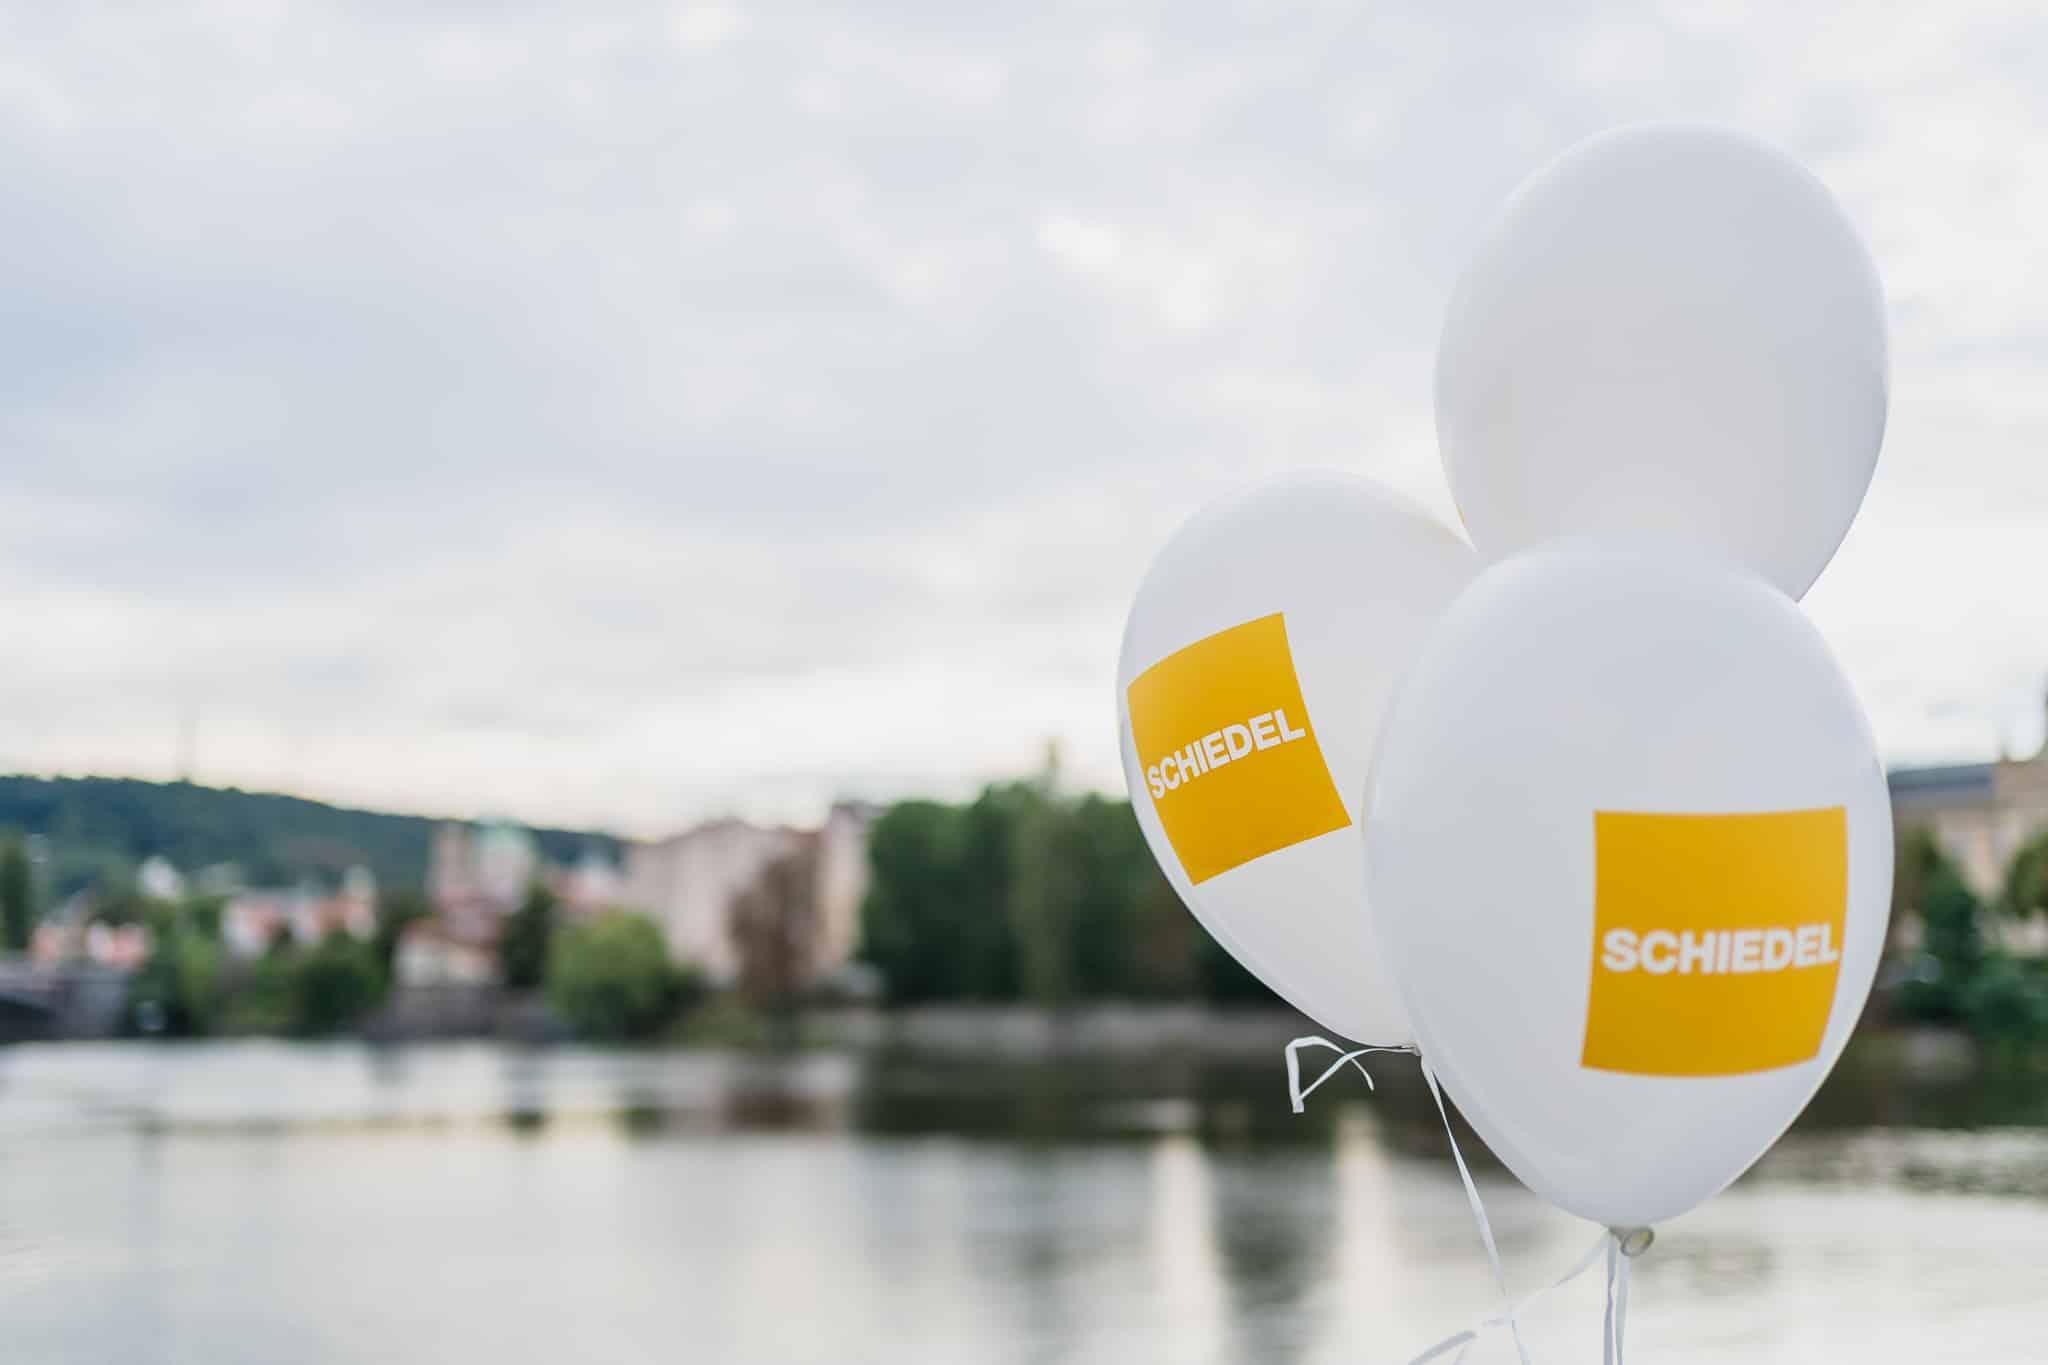 Balónky na řece.